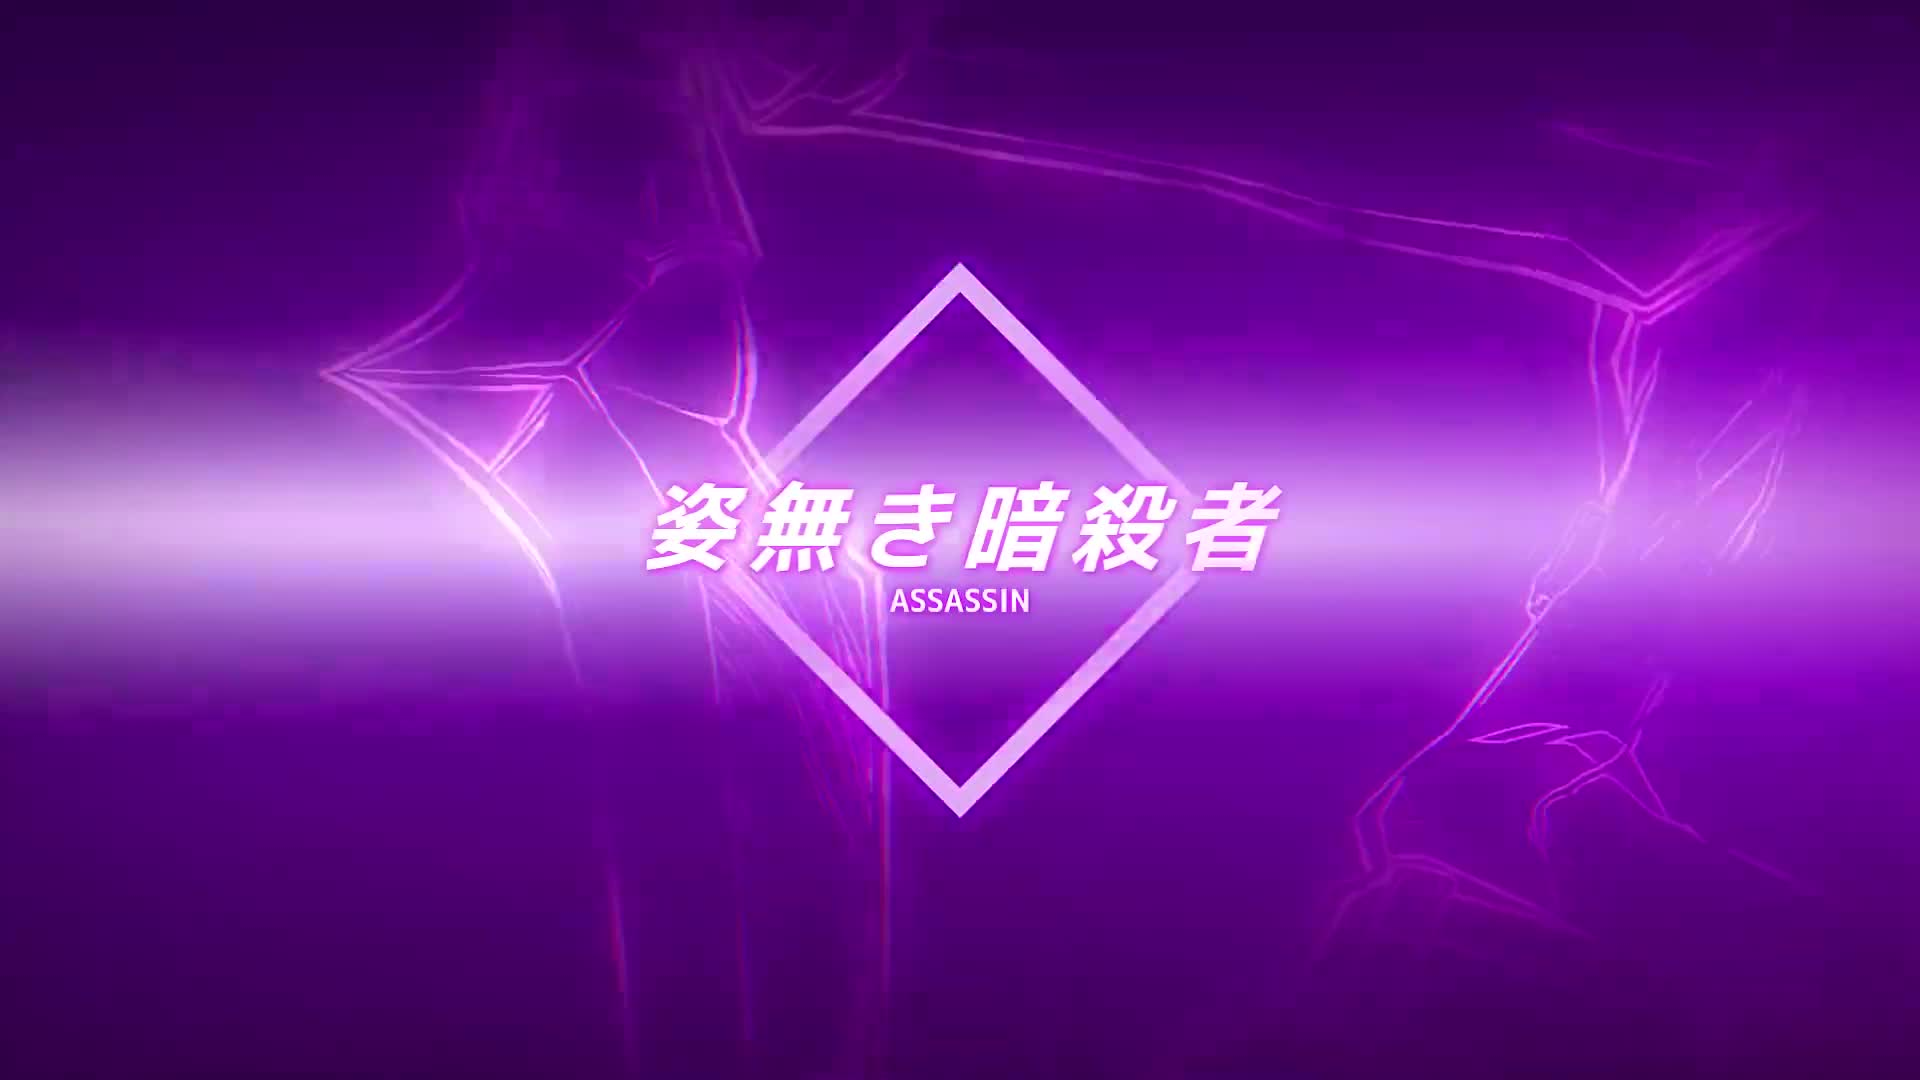 BBTAG, BLAZBLUE, P4U, RWBY, UNI, アルカナハート, アークシステムワークス, アークシステムワークス公式チャンネル, ゲーム, ブレイブルー, アーケード版「BLAZBLUE CROSS TAG BATTLE」追加参戦キャラクター紹介PV(EVO Japan 2019) GIFs